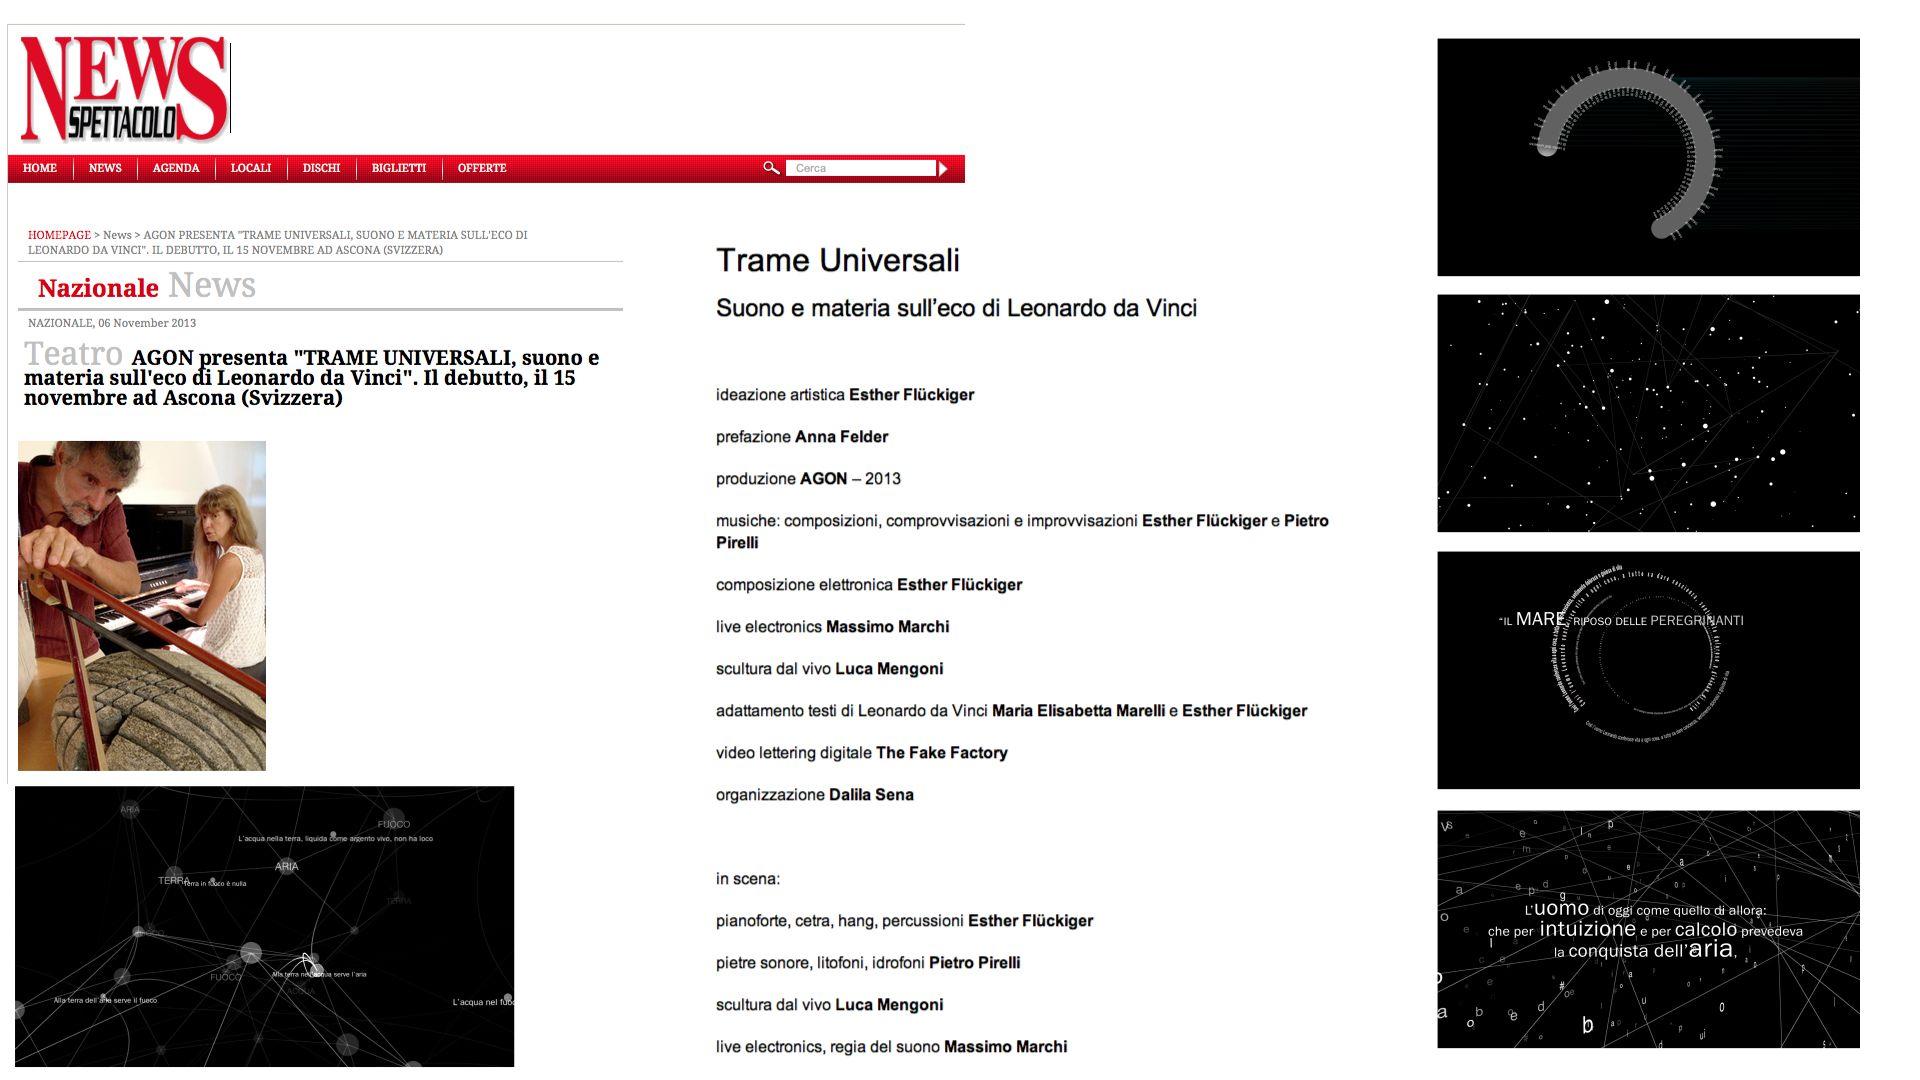 TRAME UNIVERSALI AGON THE FAKE FACTORY 02